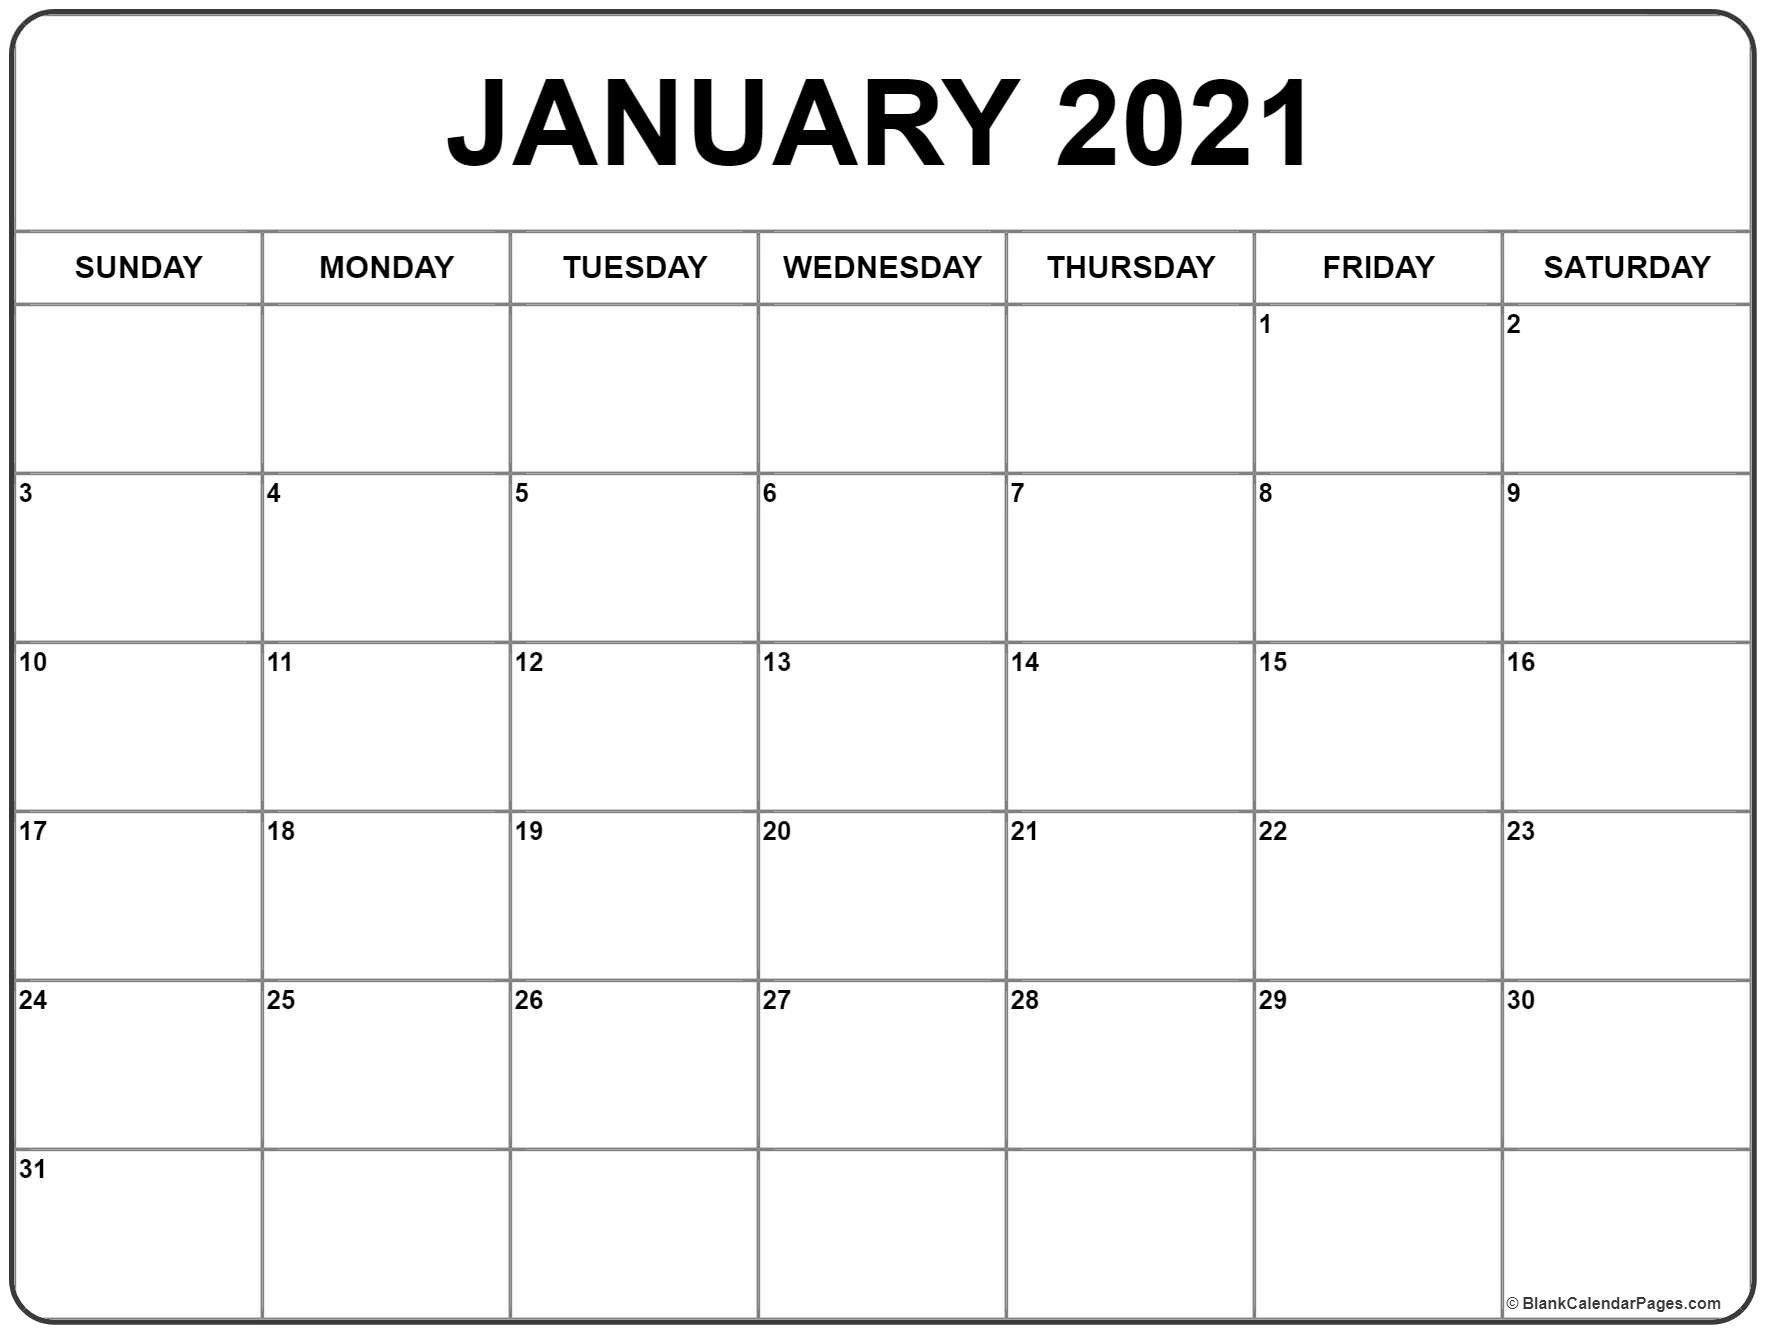 Blank Monthly Calendar 2021 June 2021 With Grid | Calendar